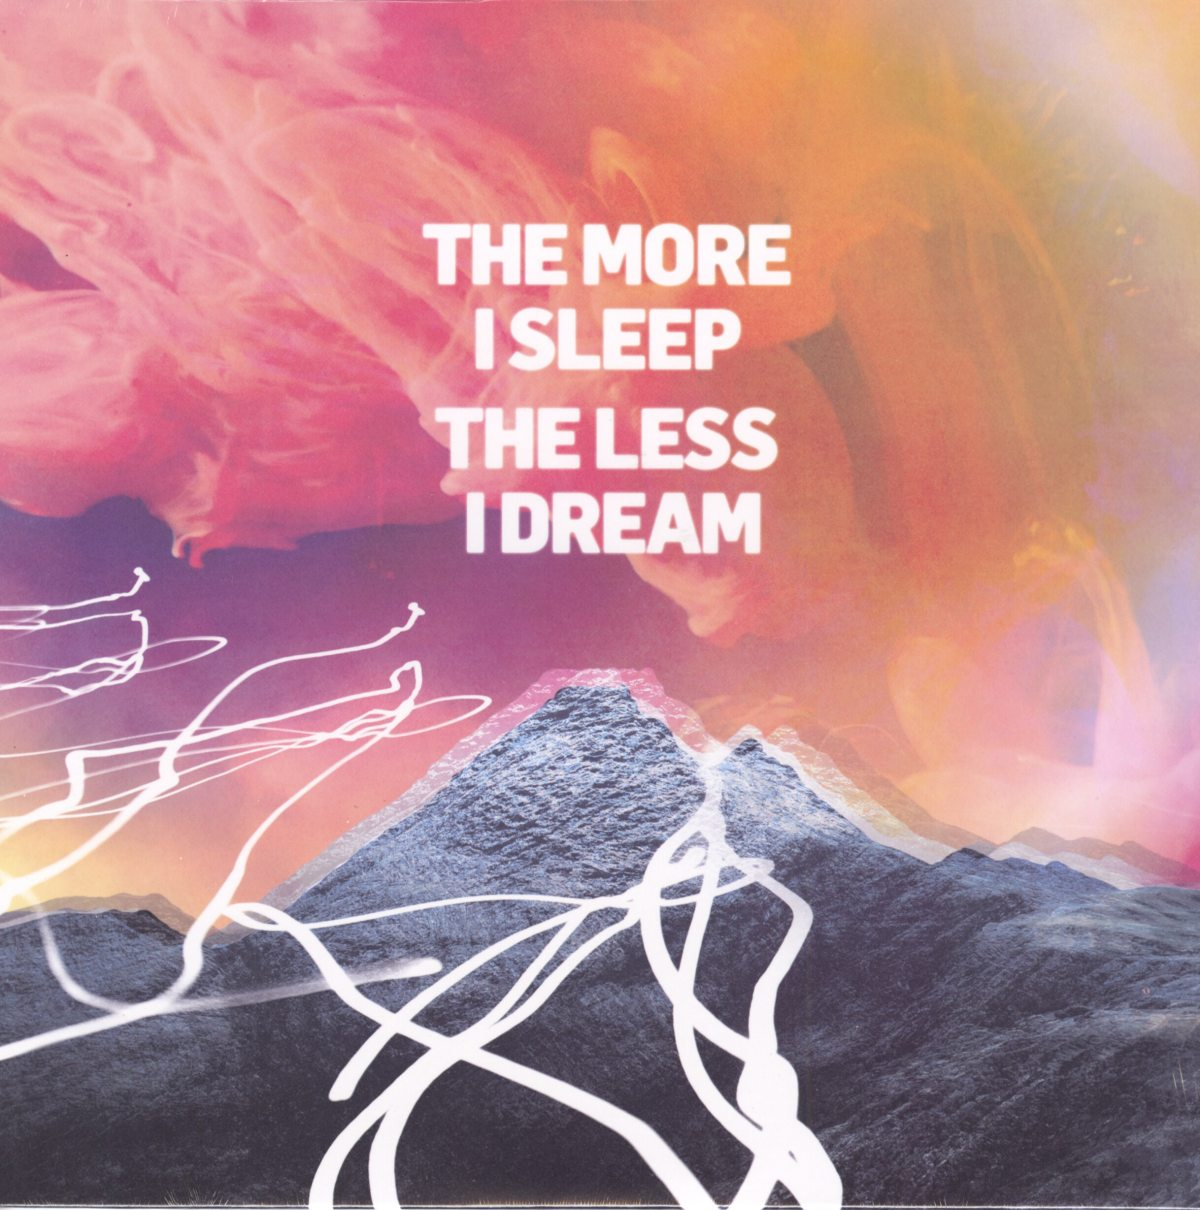 We Were Promised Jetpacks - The More I Sleep The Less I Dream - Magenta Colored Vinyl LP, 2018